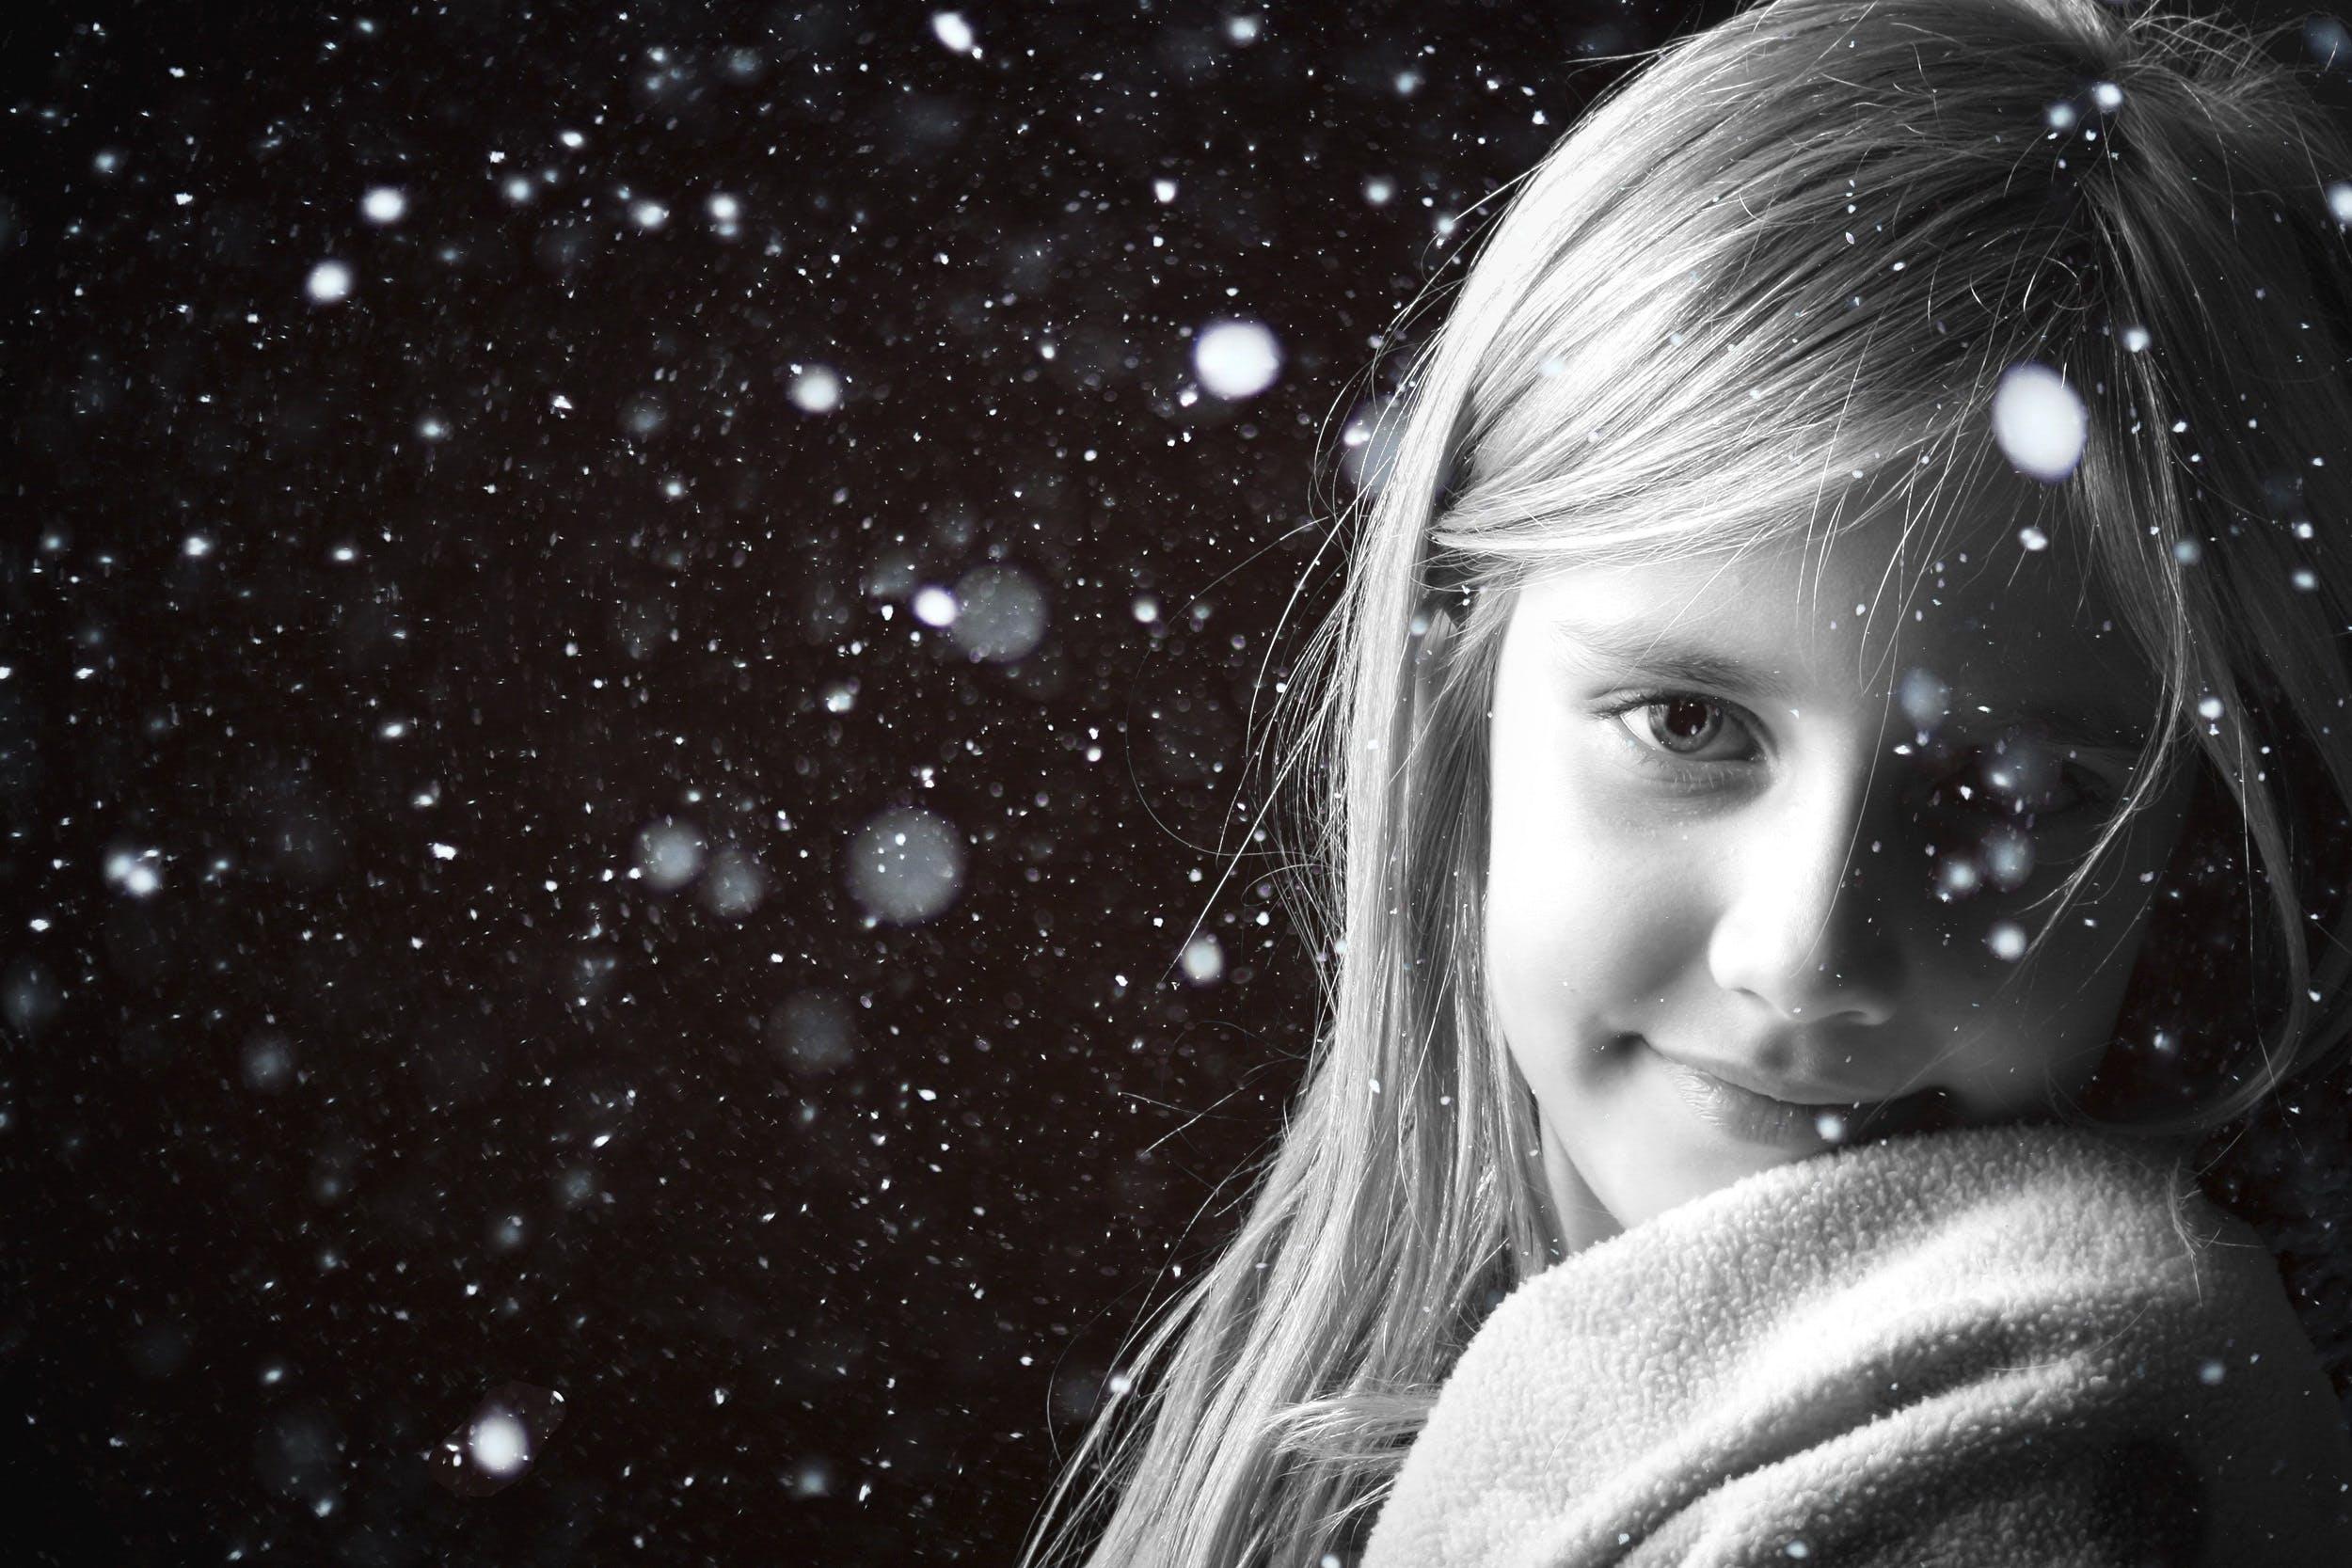 black-and-white, blur, cold